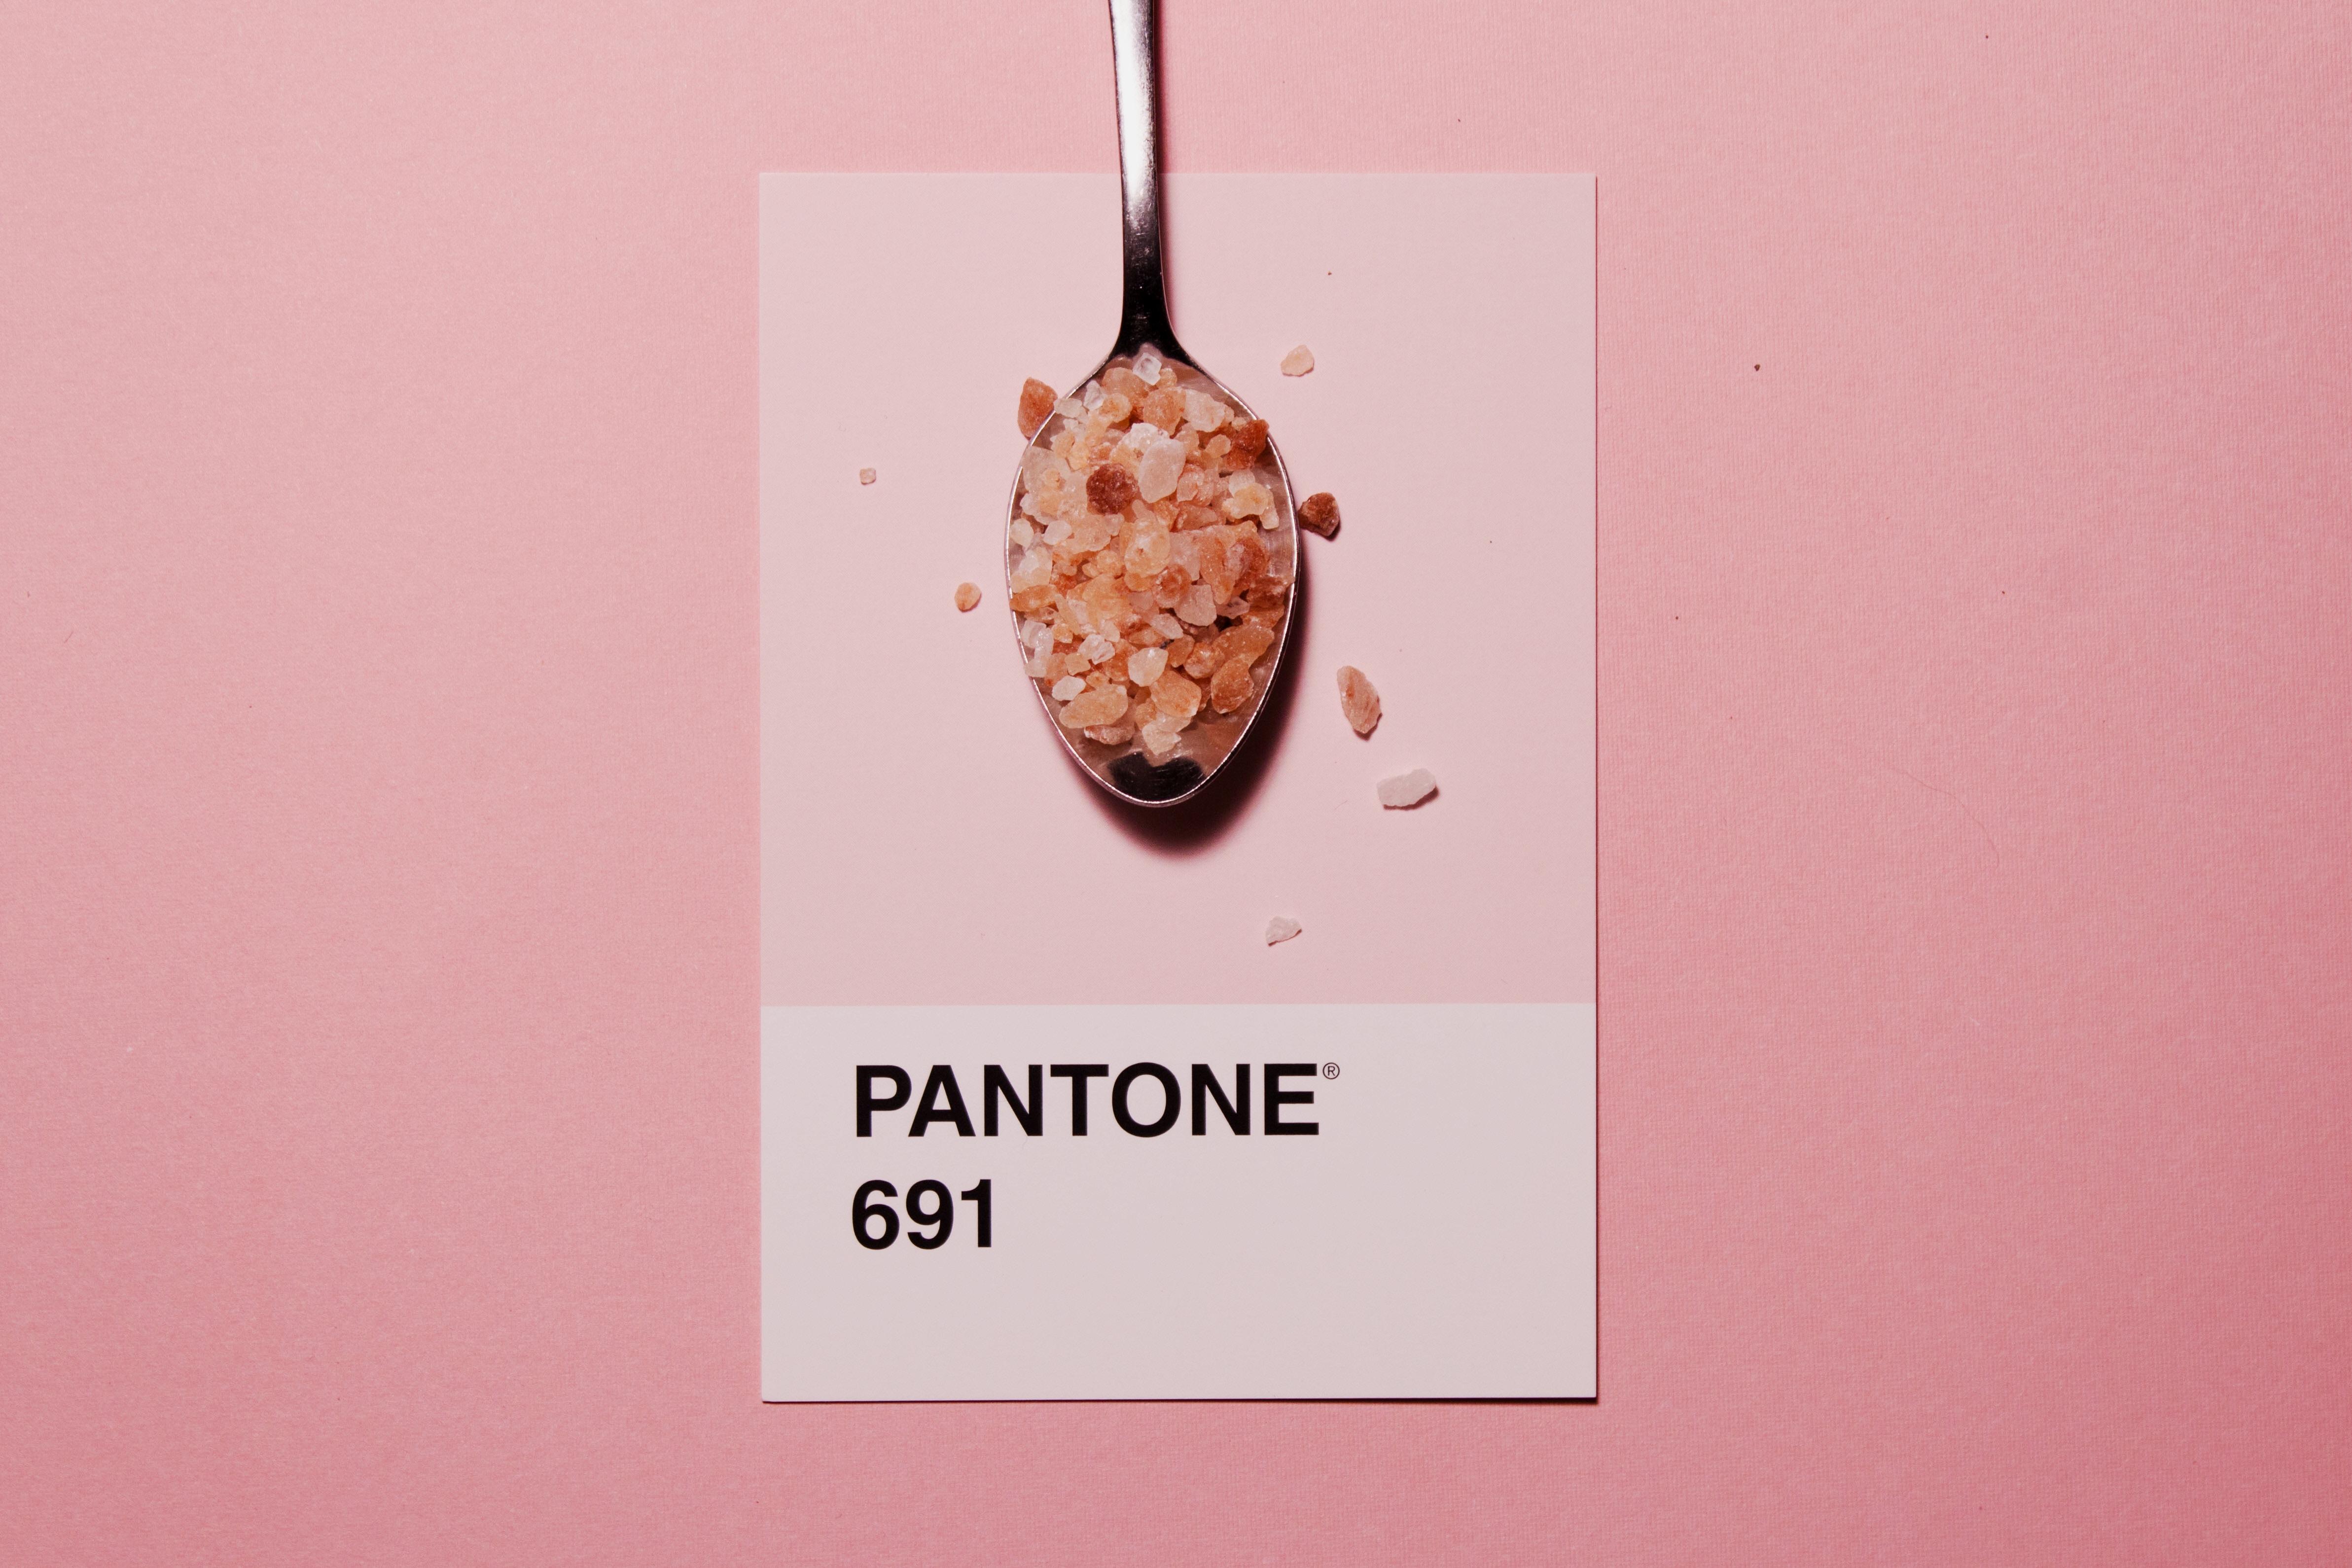 Pantone 691 color image